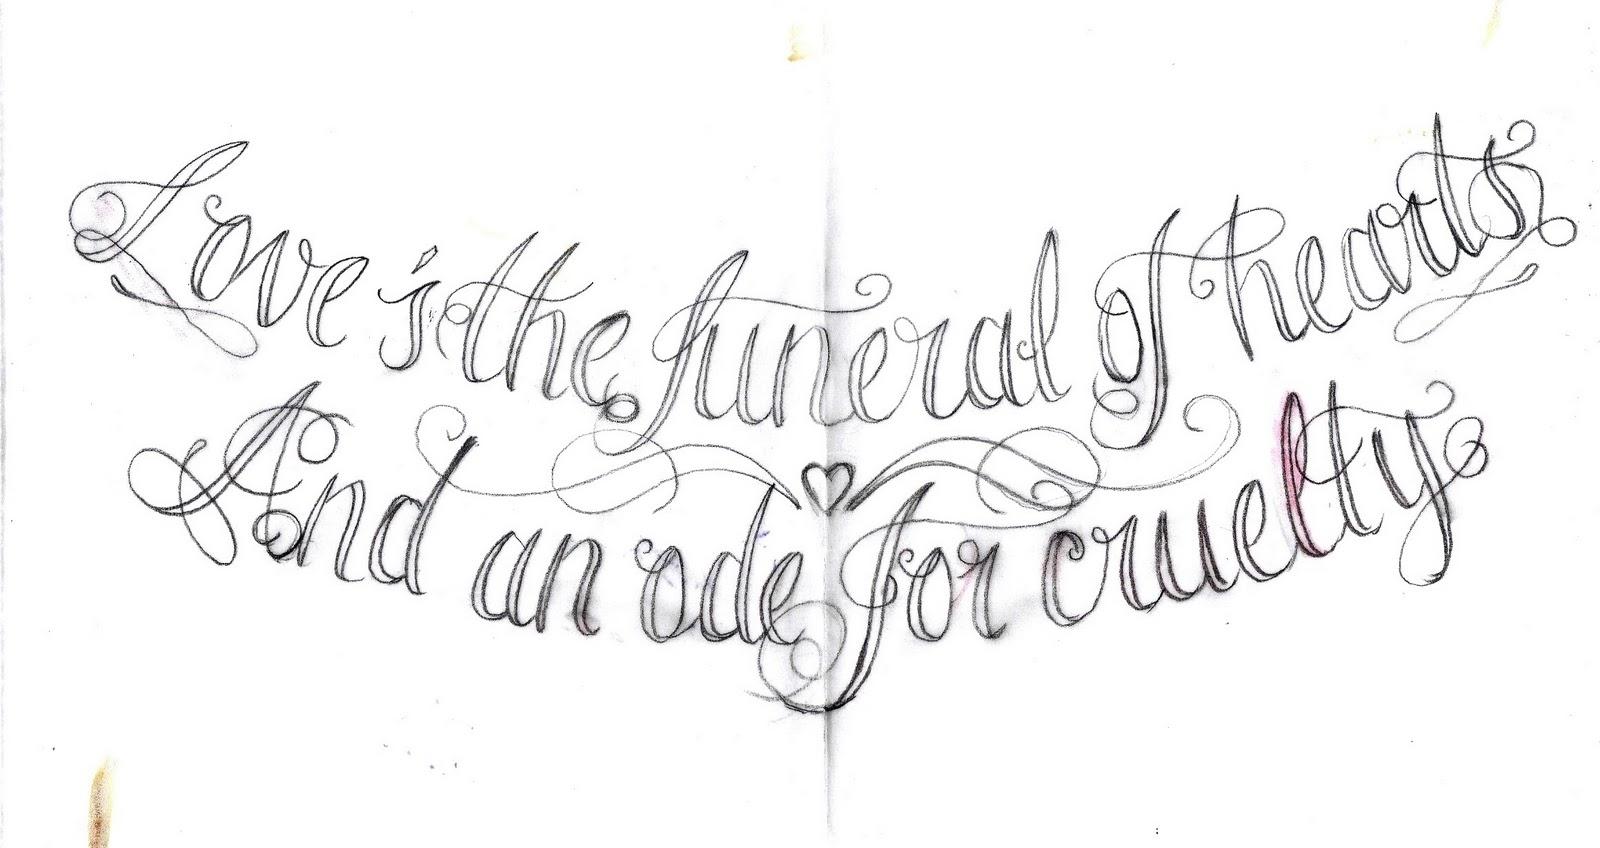 Story Of Anie: My tattoo post